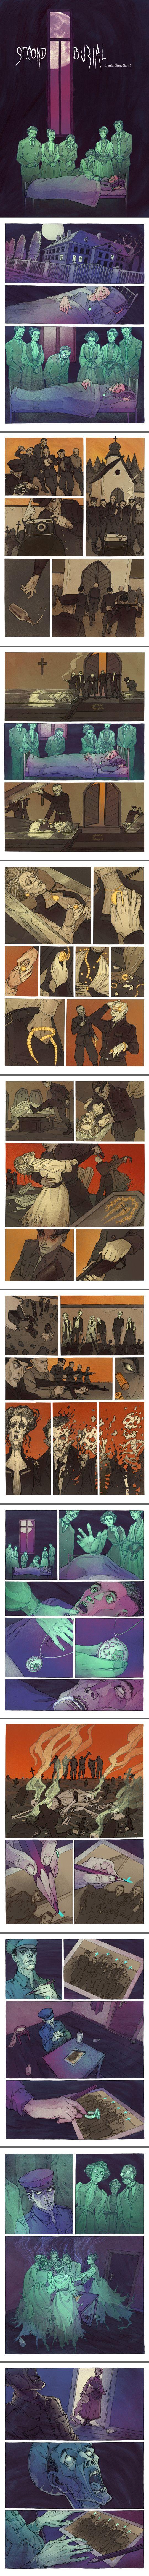 http://www.deviantart.com/art/Second-Burial-537444941 #Horror short story, click to view entire comic.